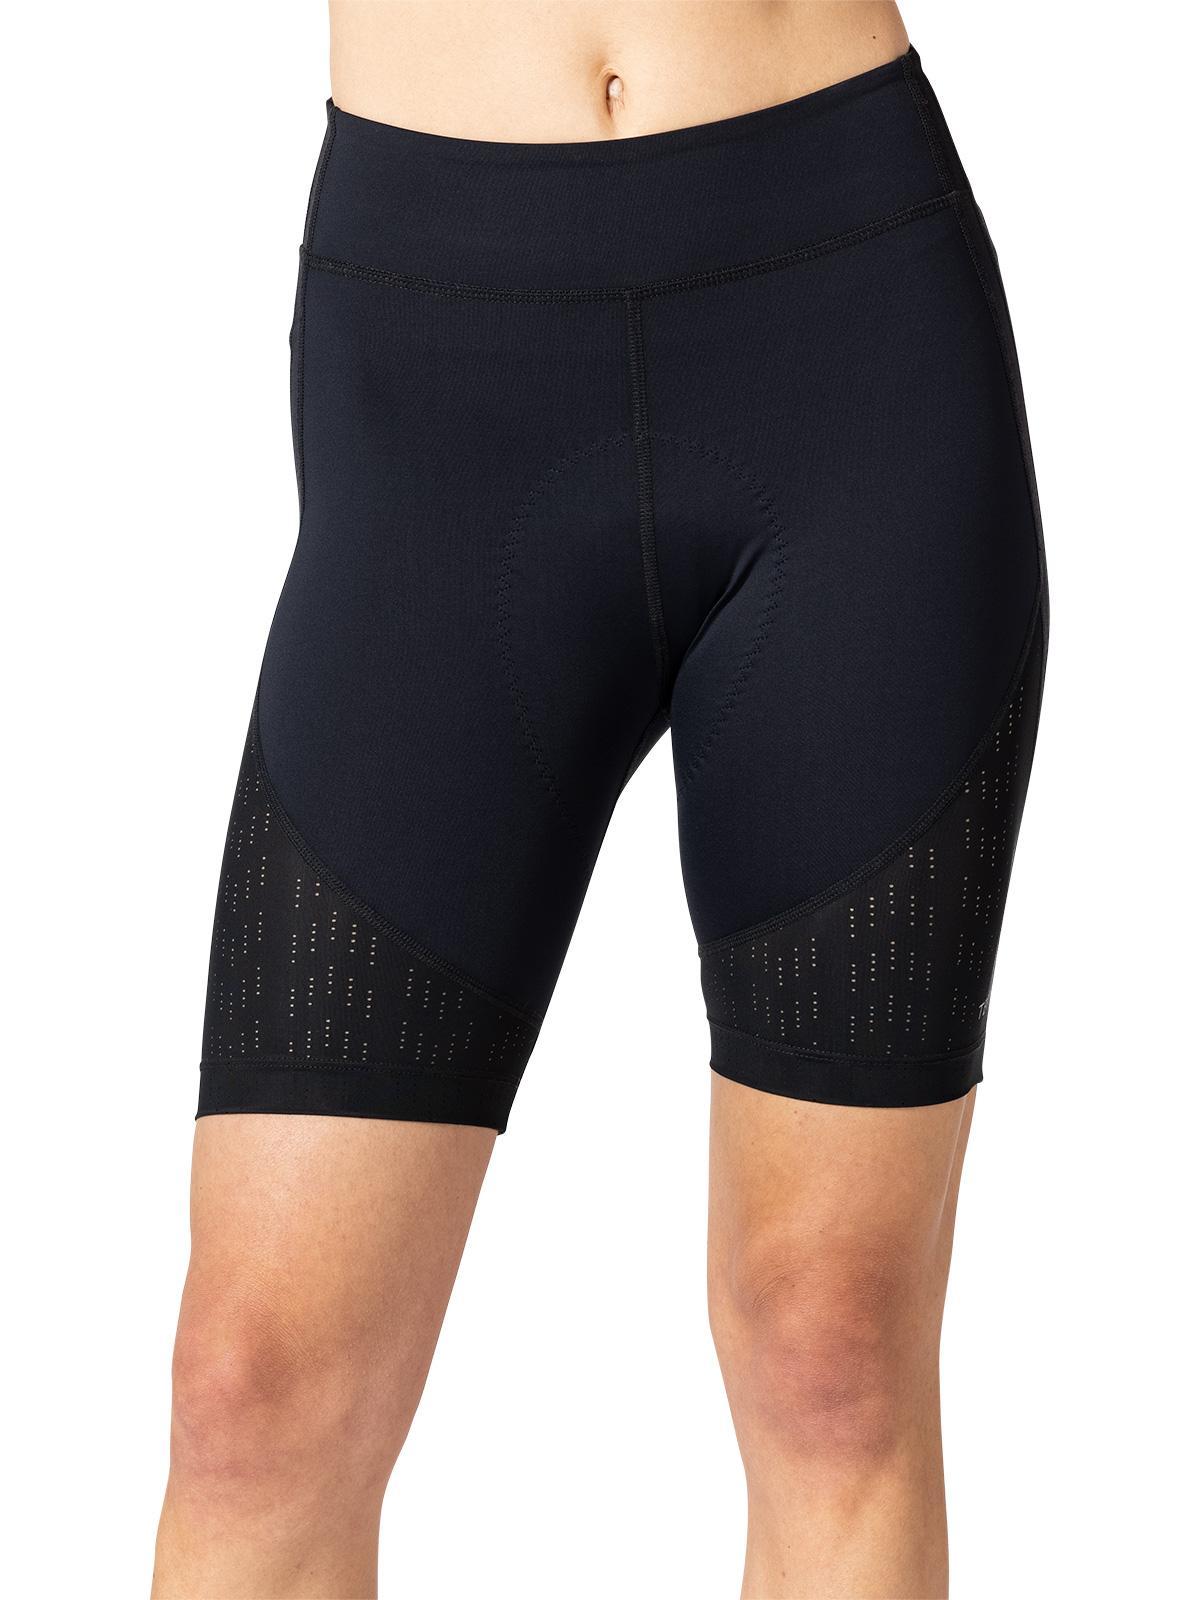 Terry Womens New Bike Bermuda Compression Shorts High Rise Leg Pocket Grip-Free Hem Longer Length Fleet Air Chamois Black Large